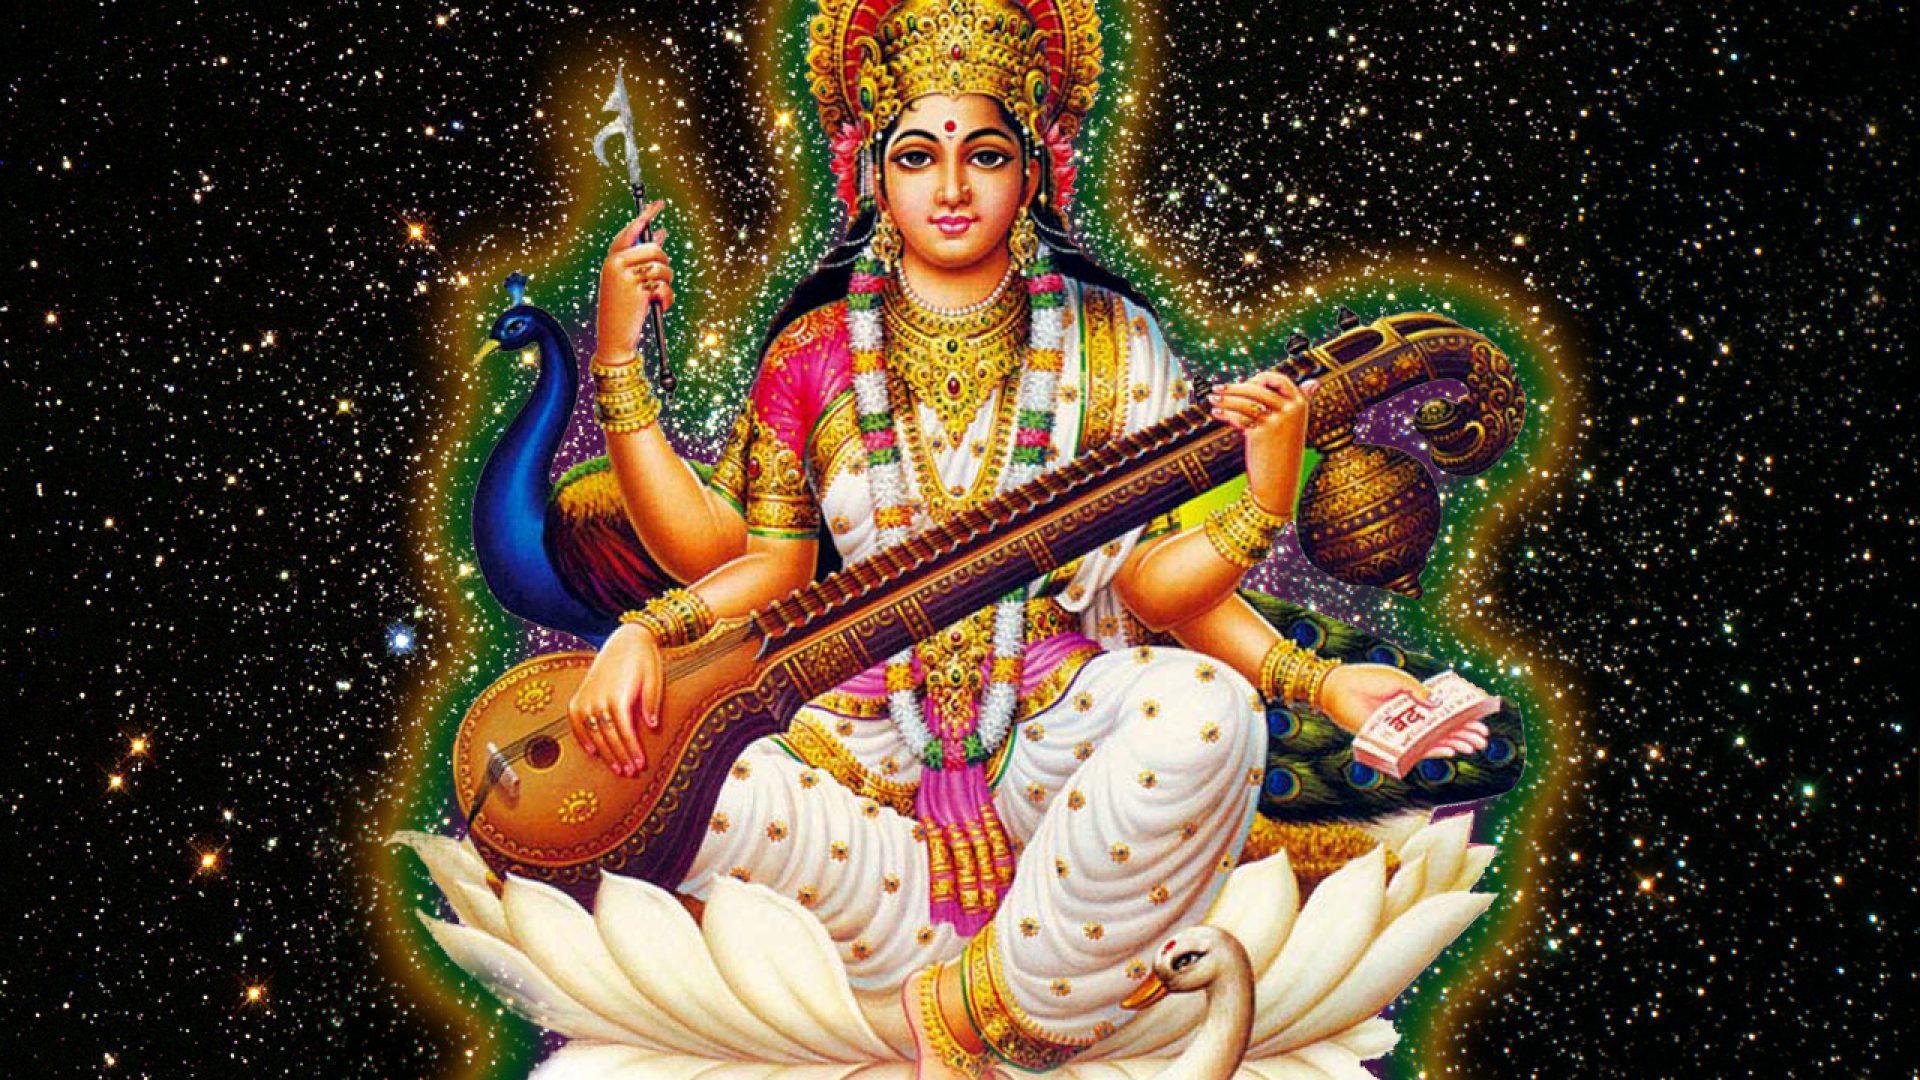 Goddess Saraswati Wallpaper - Good Morning And Happy Saraswati Puja , HD Wallpaper & Backgrounds